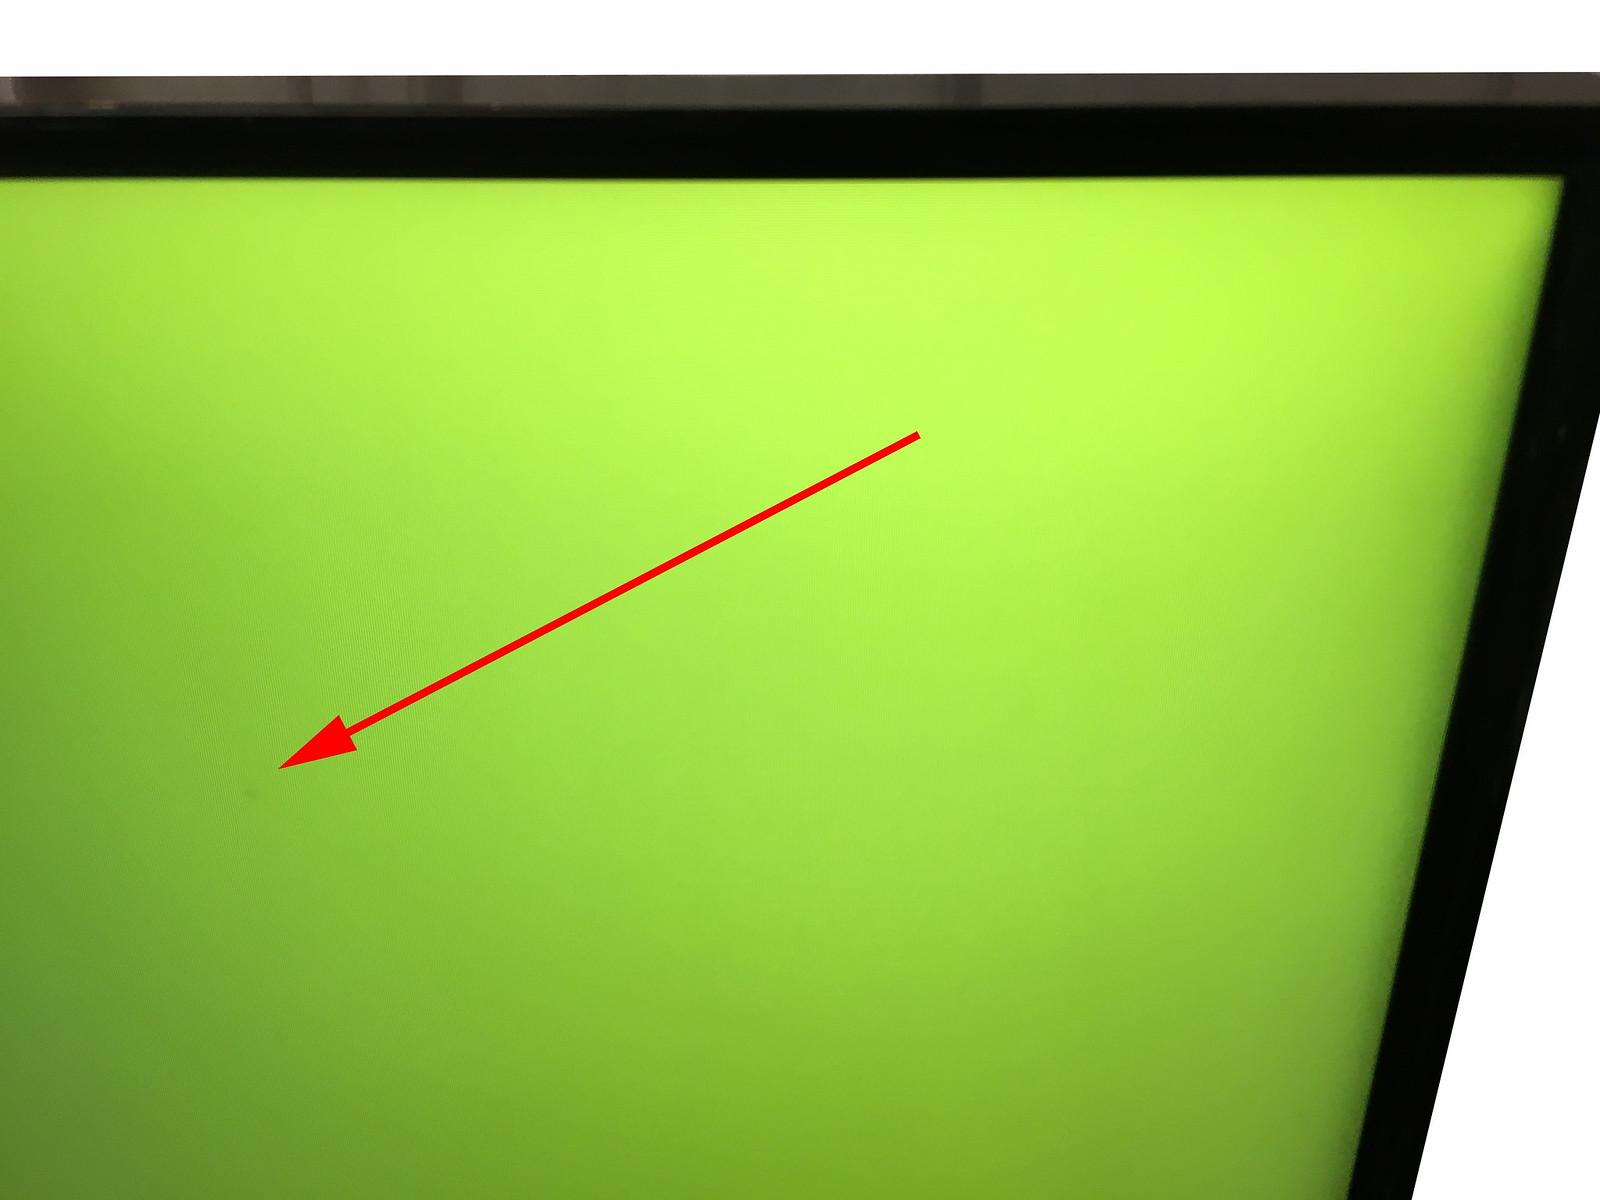 Images of Led Monitor Image Burn. OWNER'S MANUAL ...